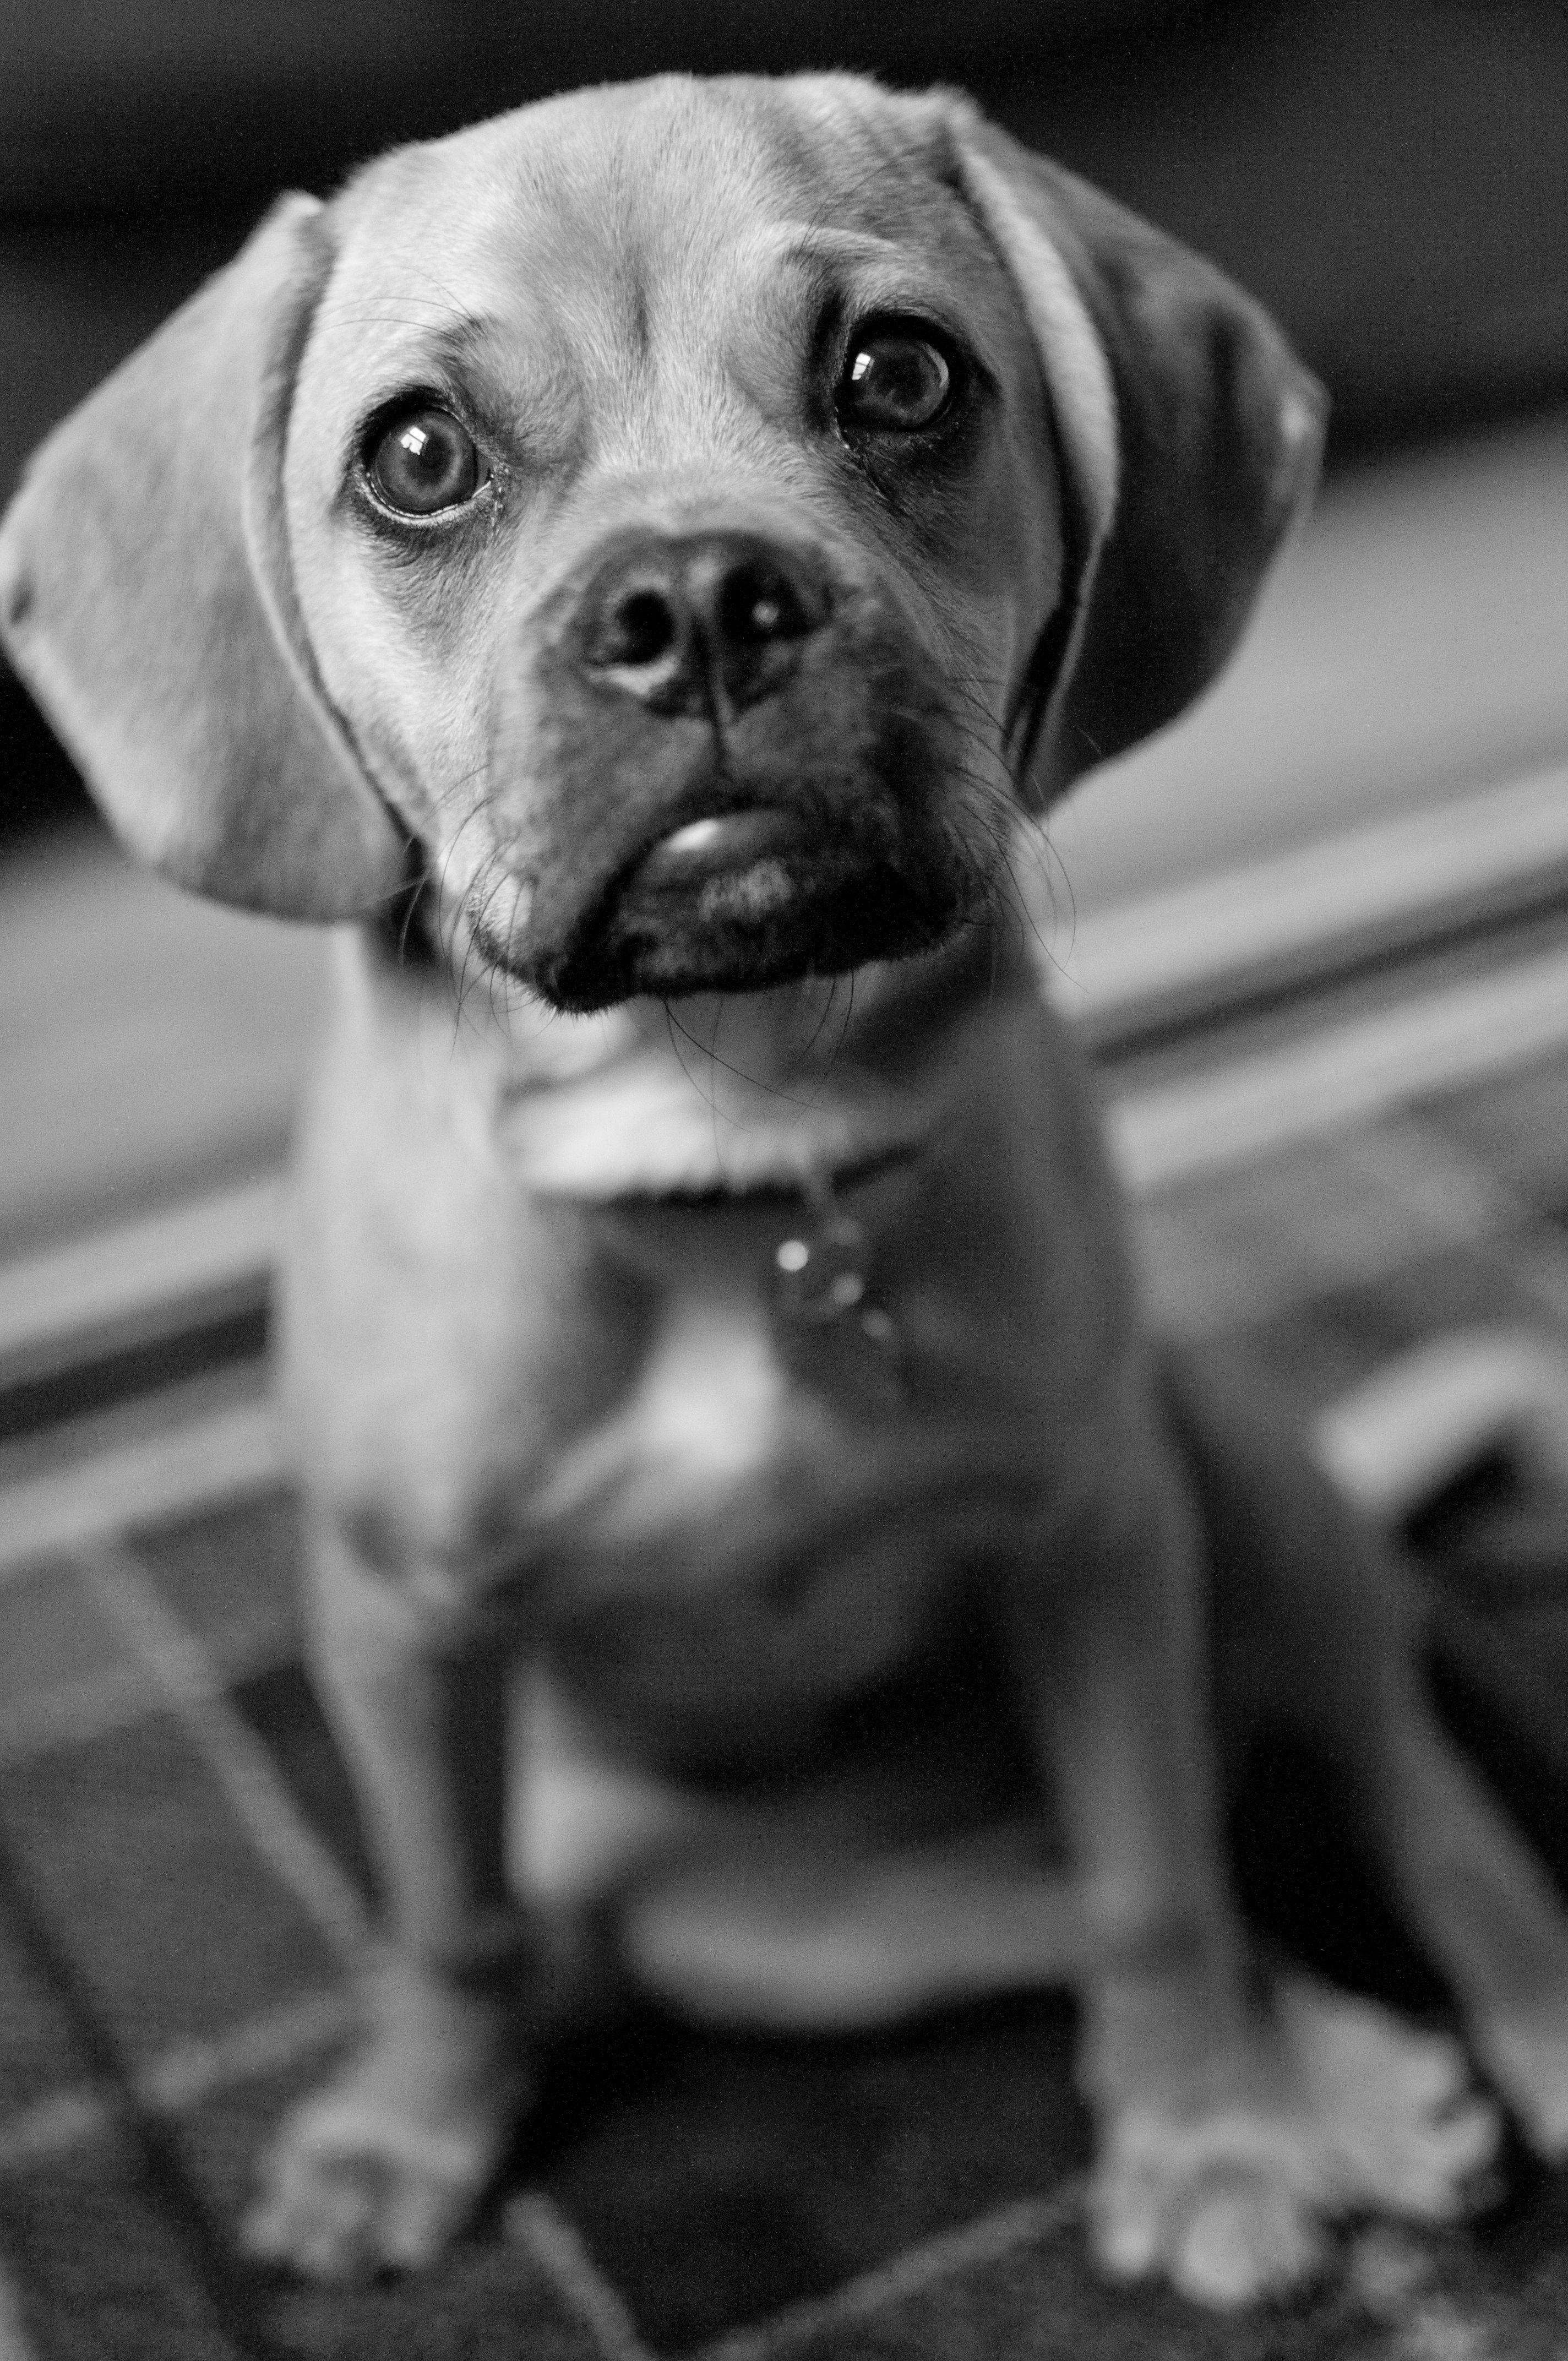 Puggle puppy black & white | My Photography | Pinterest ...  White